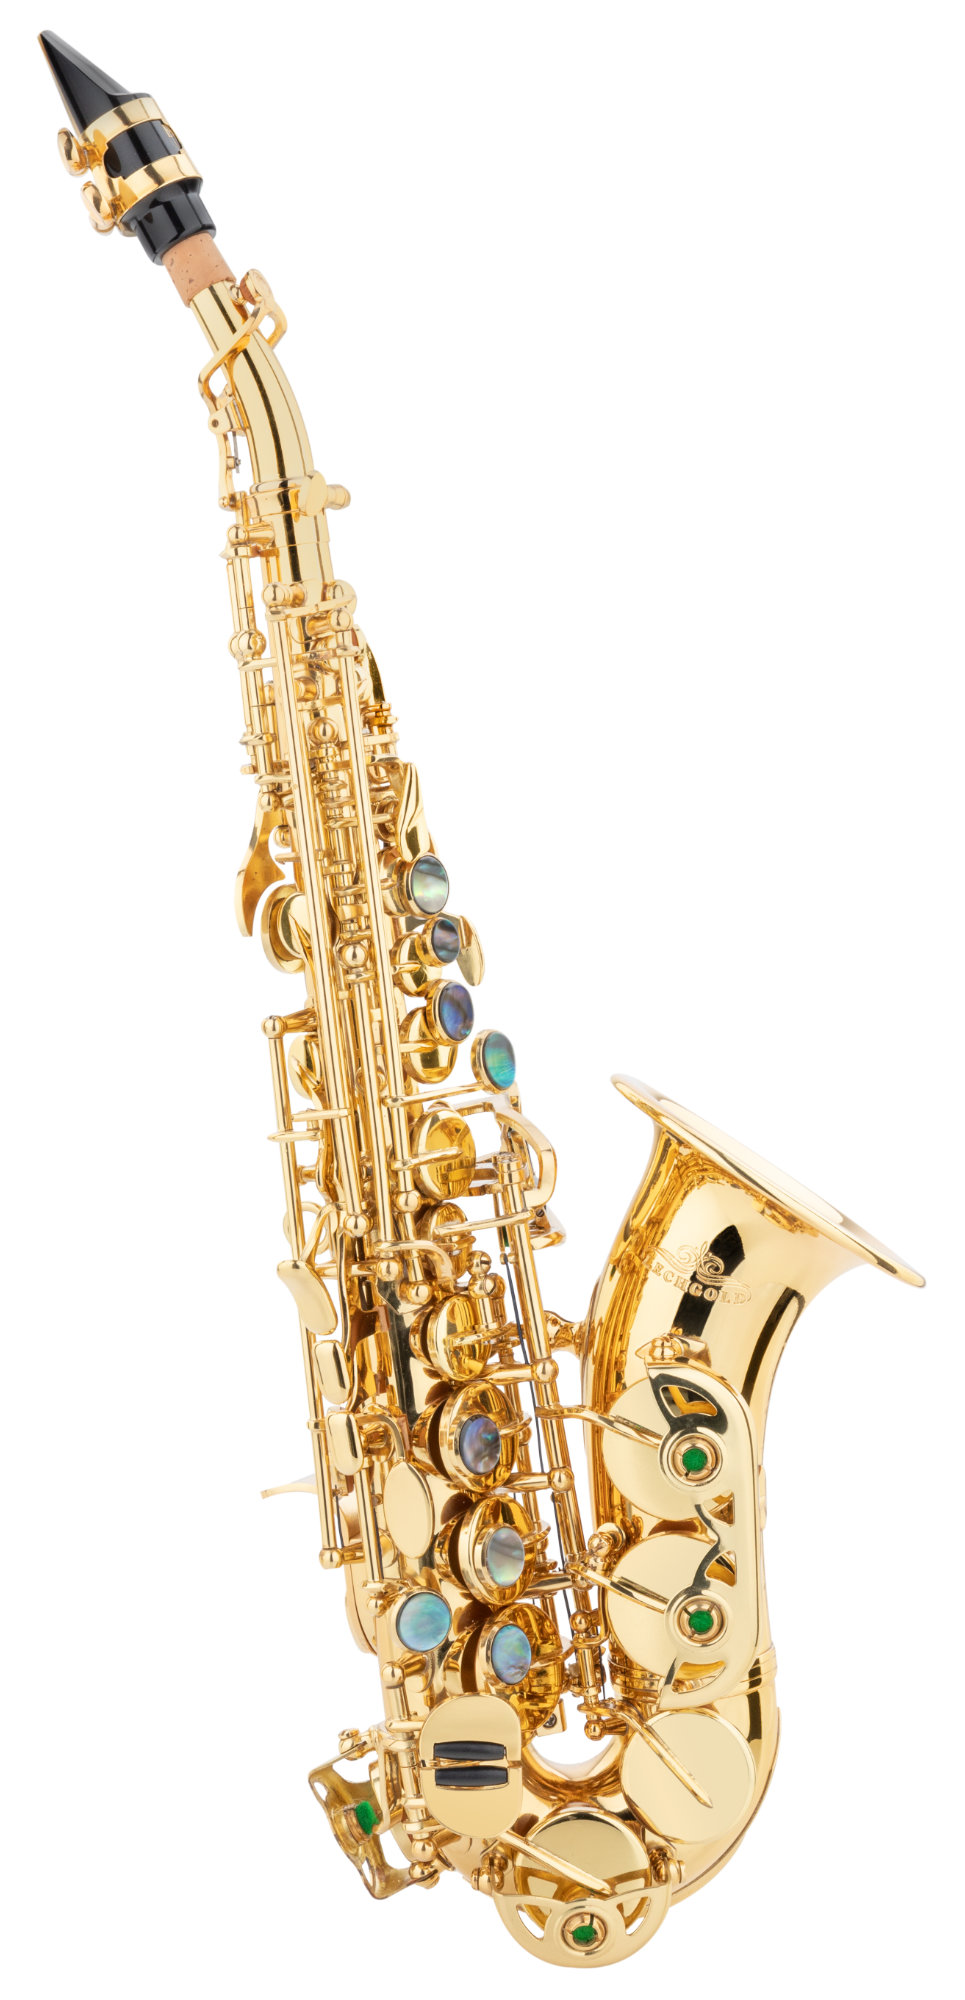 Saxophone - Lechgold LSS 20Lc Sopran Saxophon lackiert - Onlineshop Musikhaus Kirstein